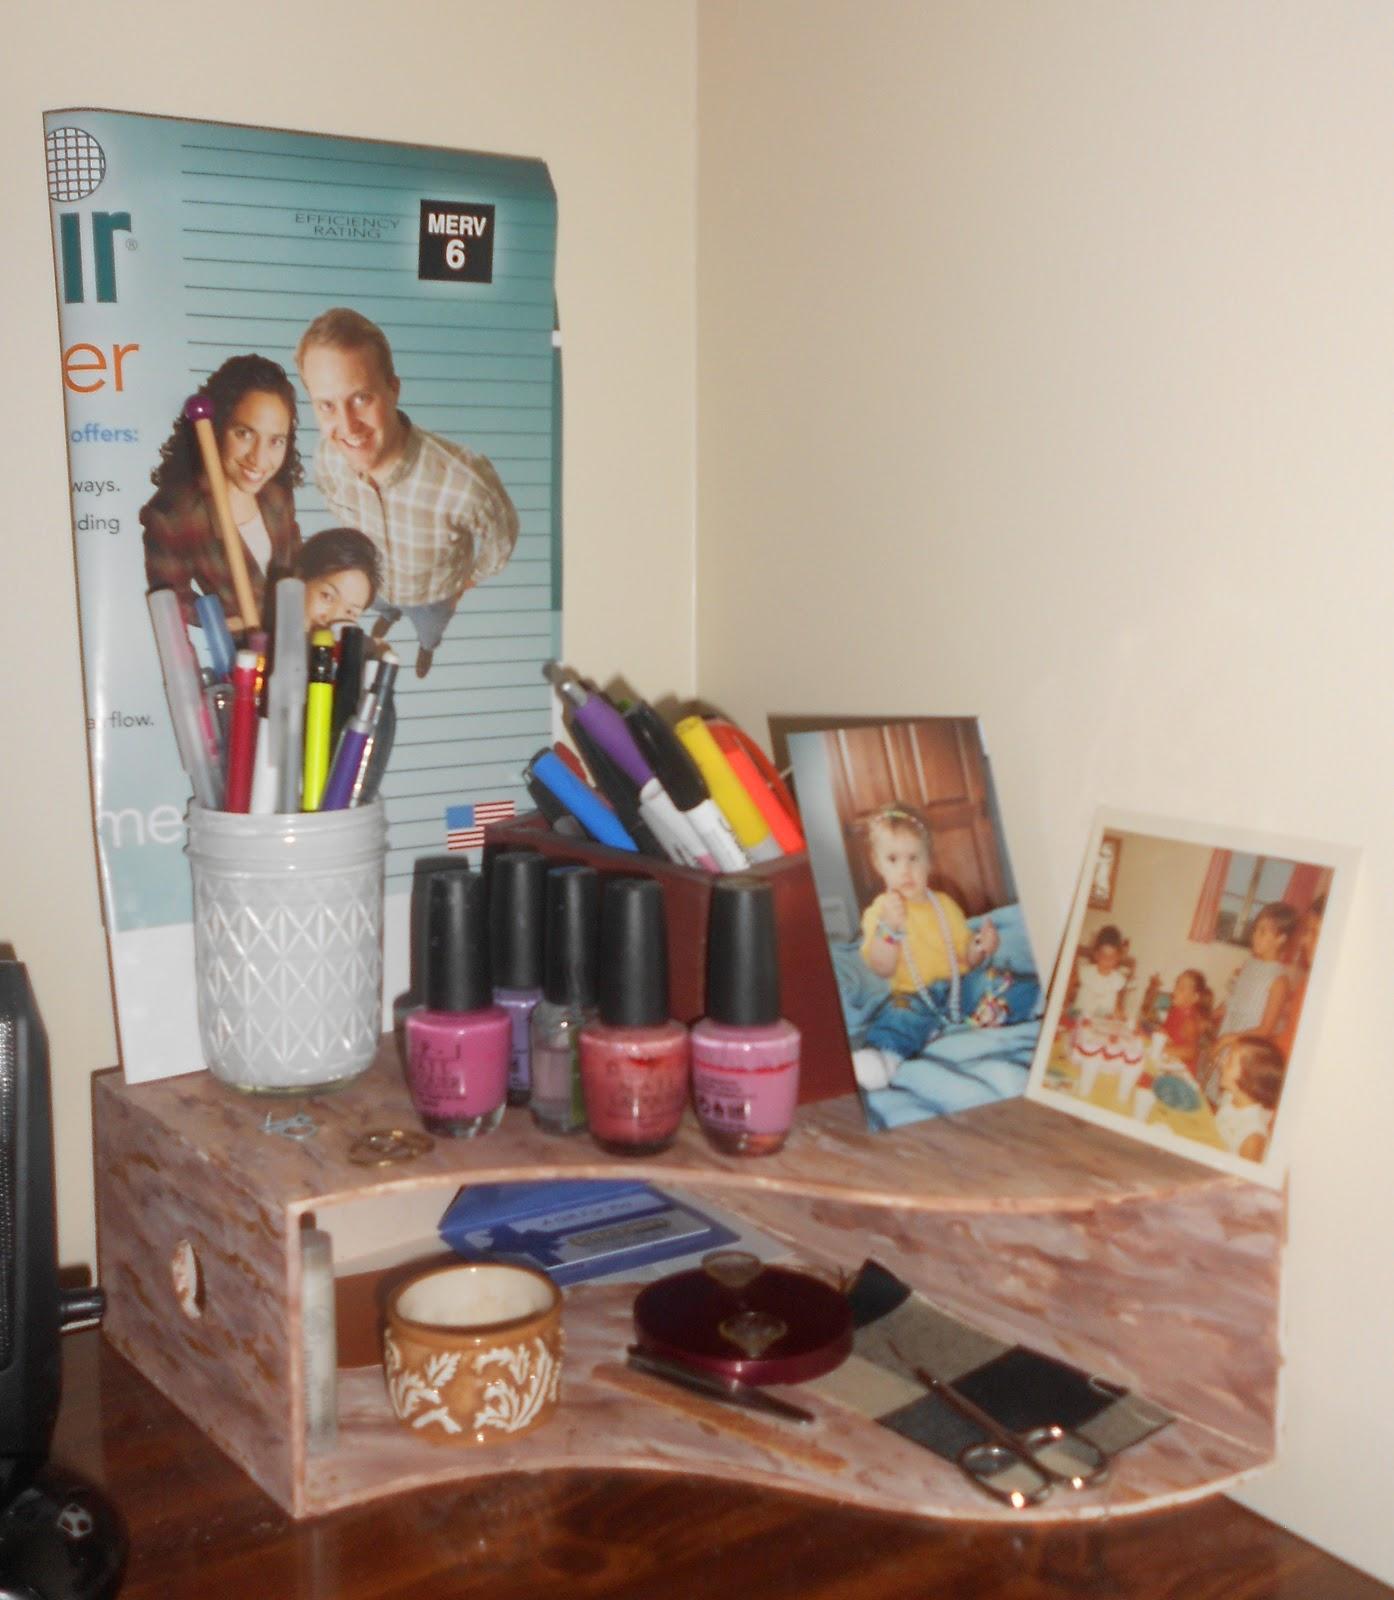 akawest: Ikea KNUFF Magazine Holder Shelf